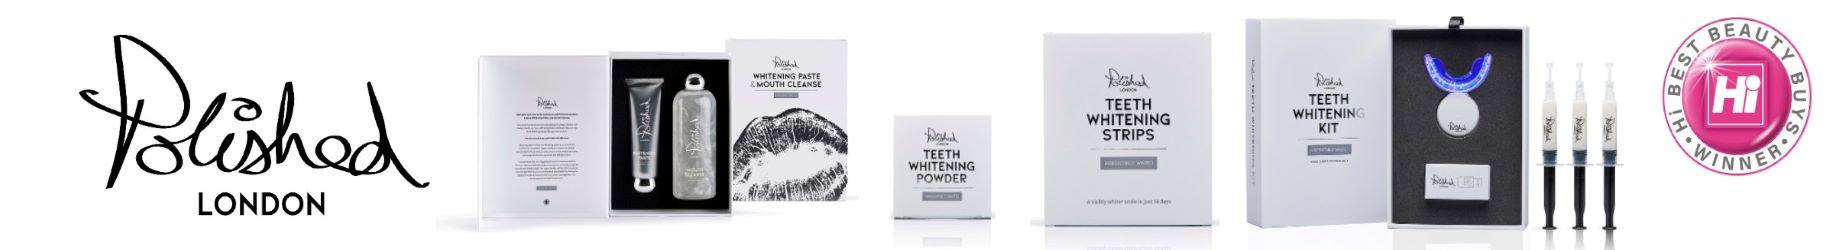 polished london teeth whitening